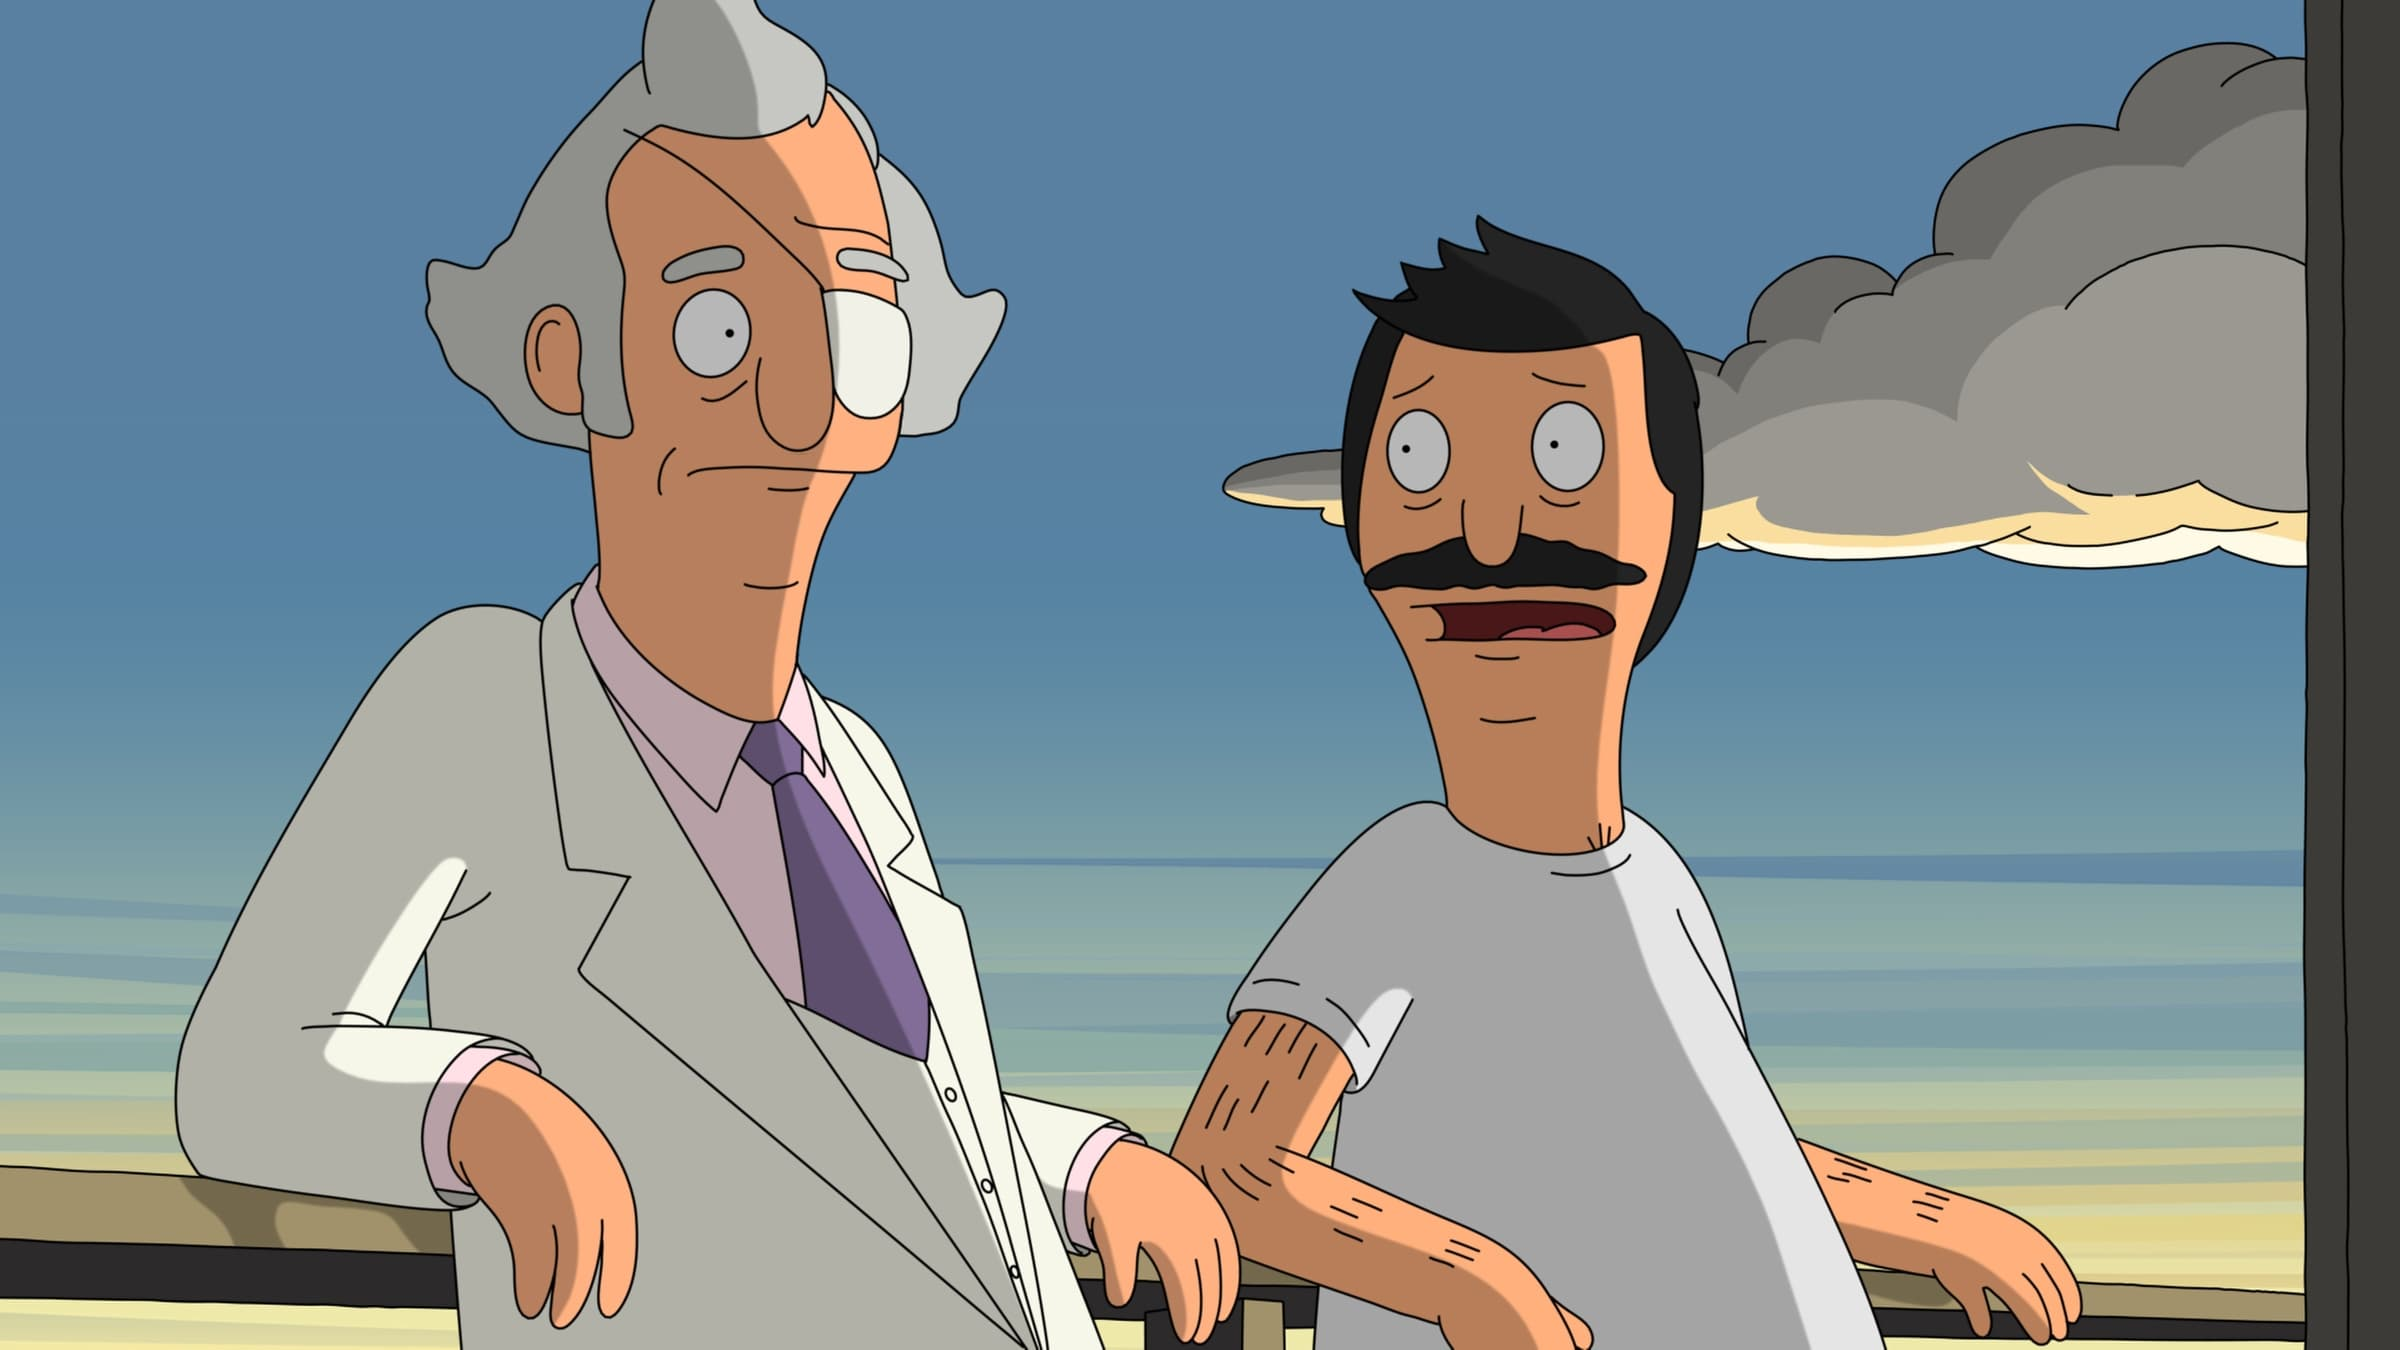 Bob's Burgers - Season 4 Episode 21 : Wharf Horse (or How Bob Saves/Destroys the Town - Part I)